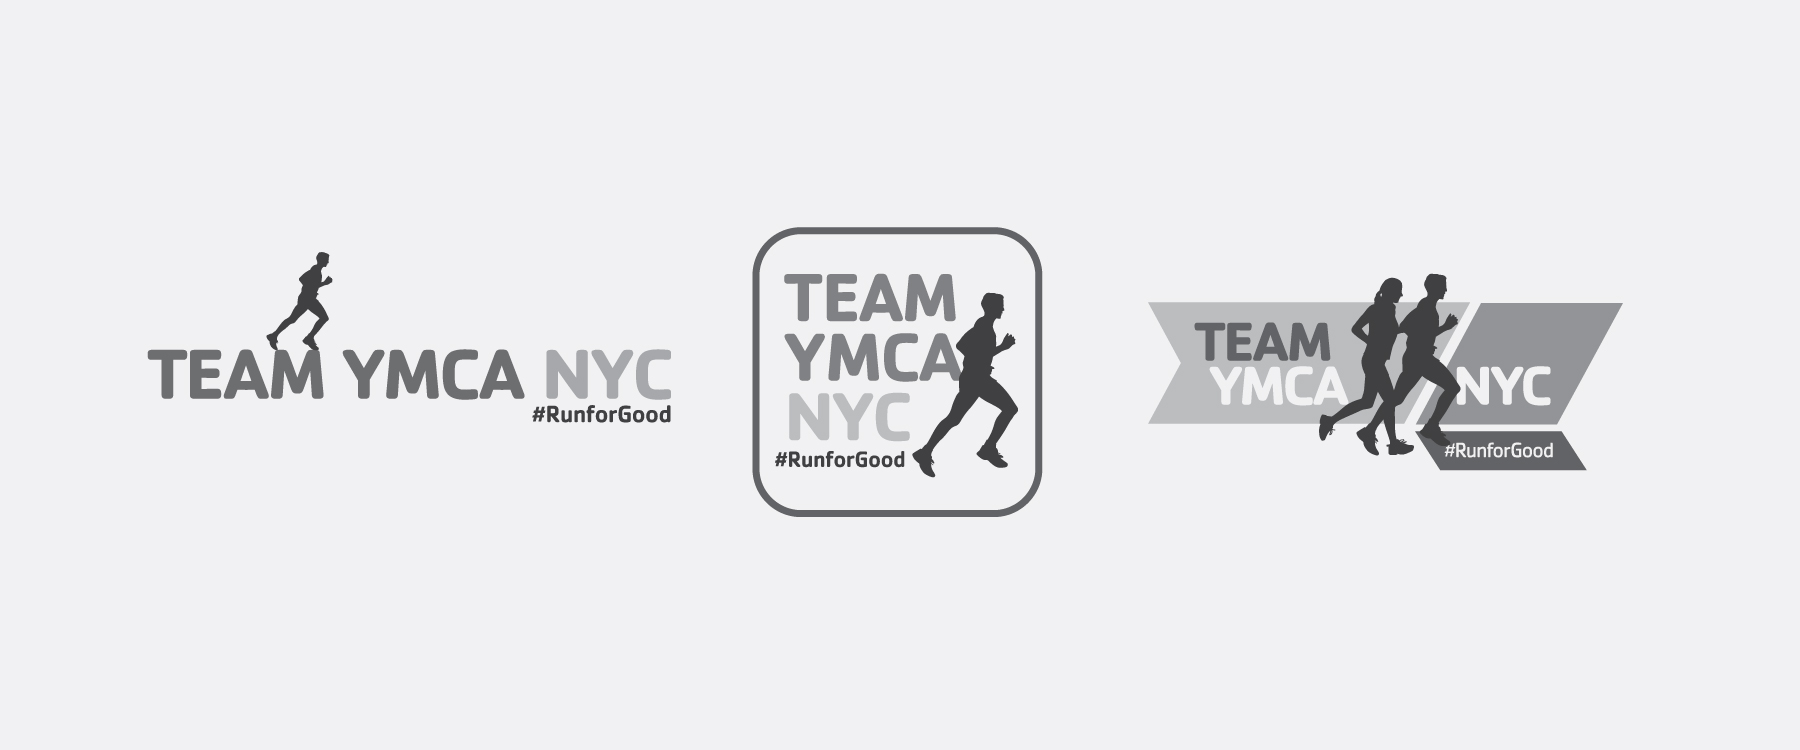 YMCA TEAM MARATHON LOGO AND LOGO STUDY